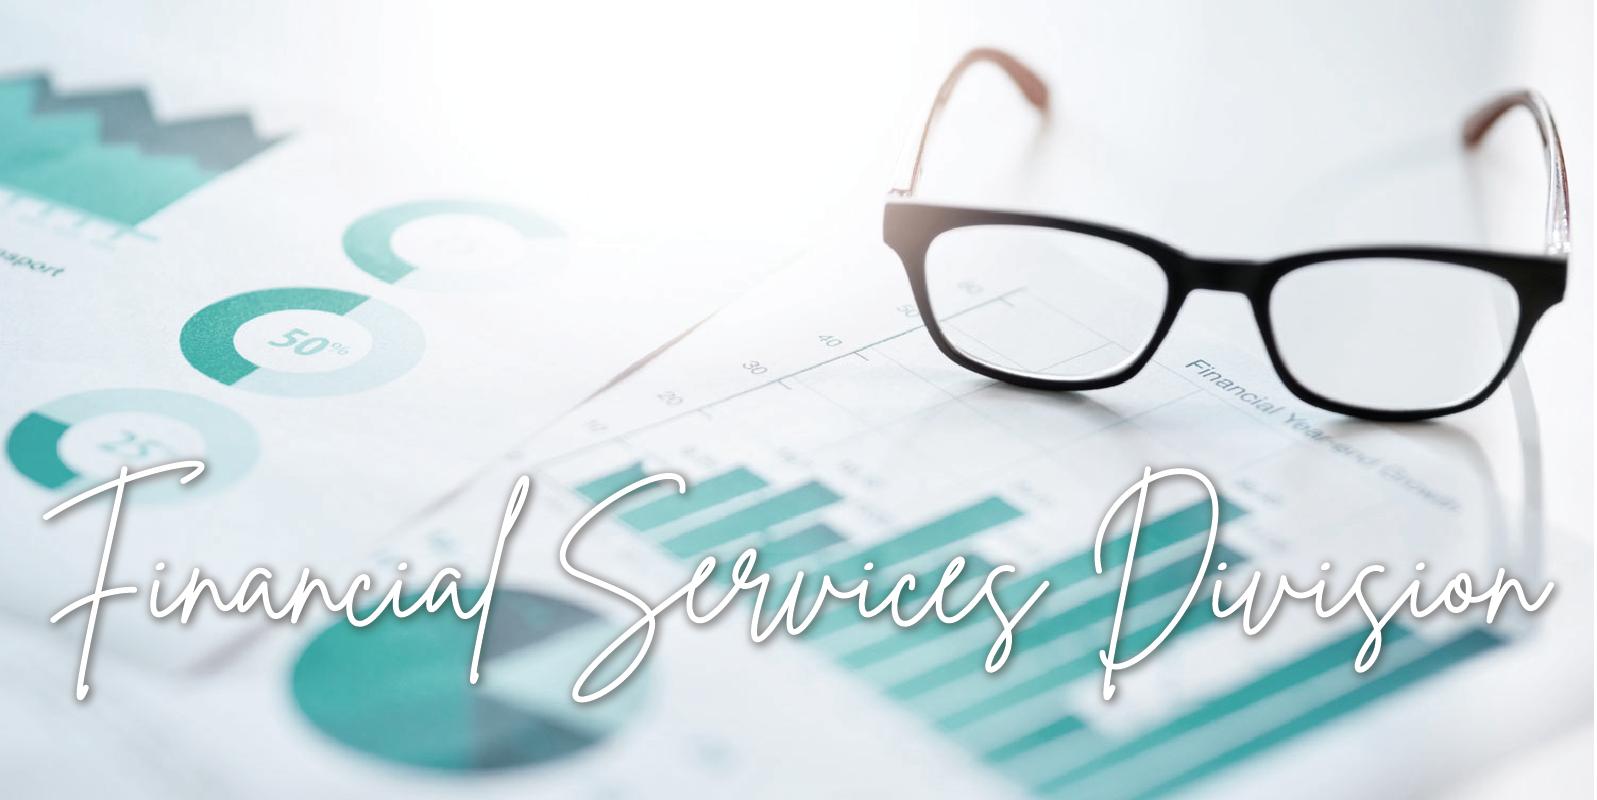 SSBC Website Header, Financial Services-02.png